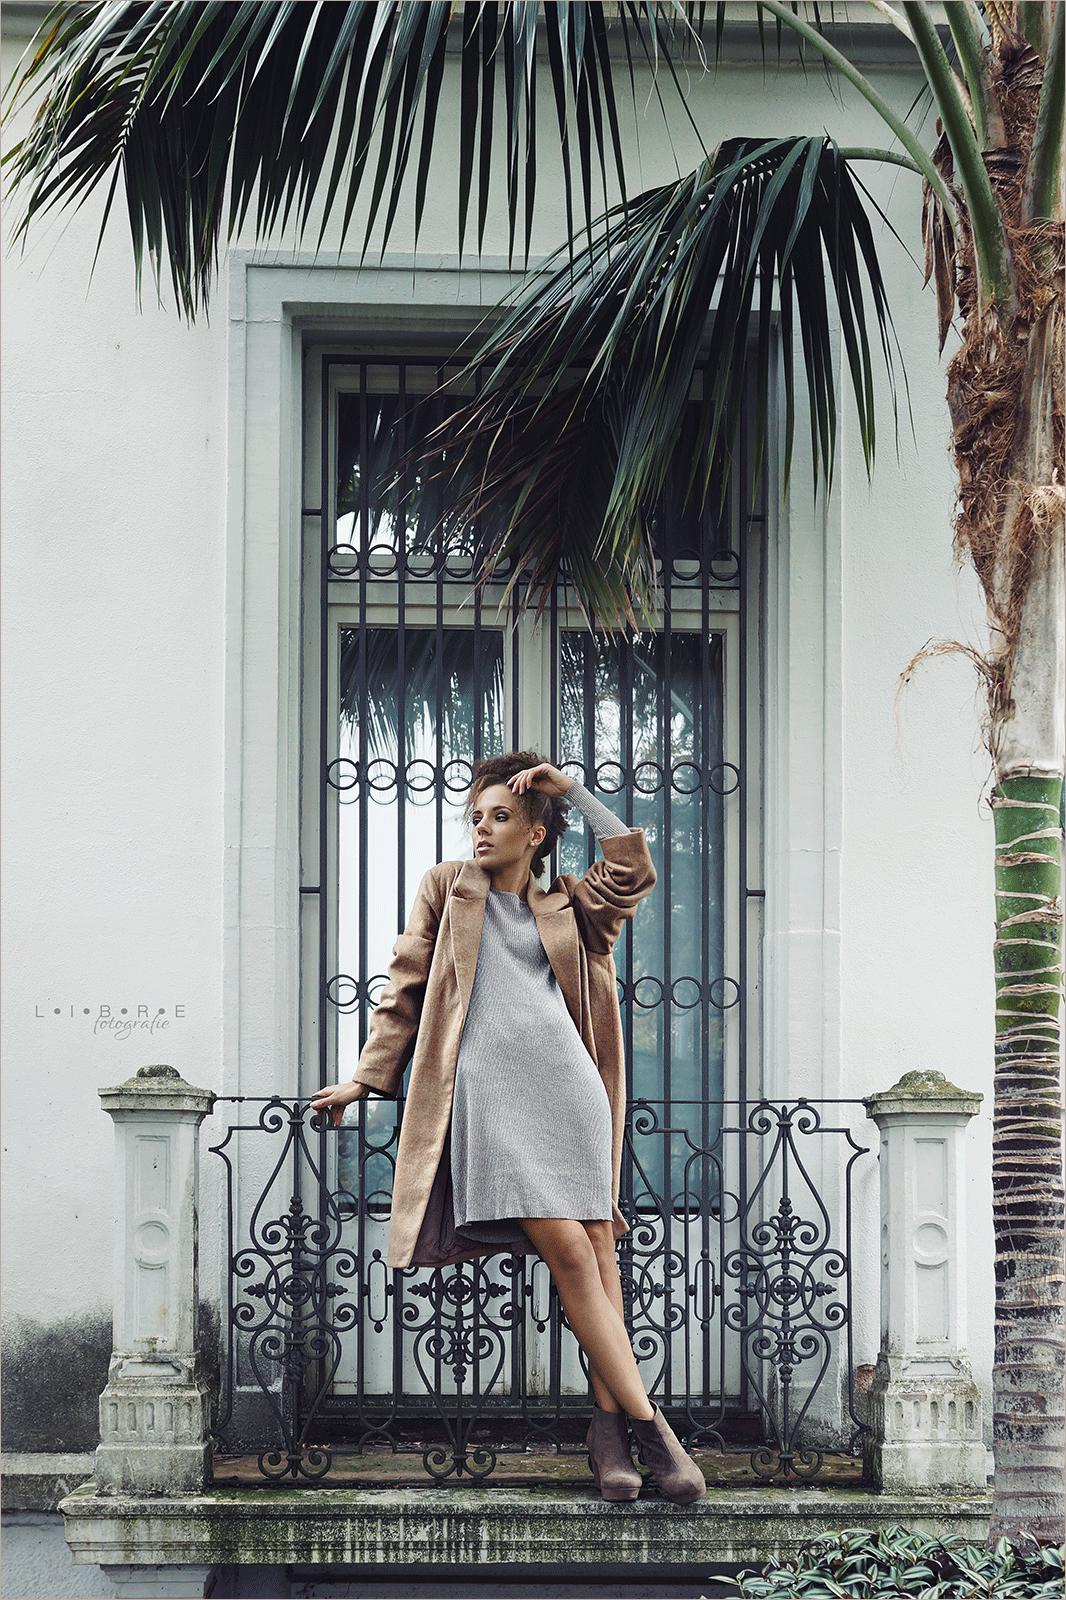 [ #DBVDH ] LIBRE Fotografie | A Little Fashion | https://www.filizity.com/lifestyle/libre-fotografie-die-bunte-vielfalt-des-handwerks